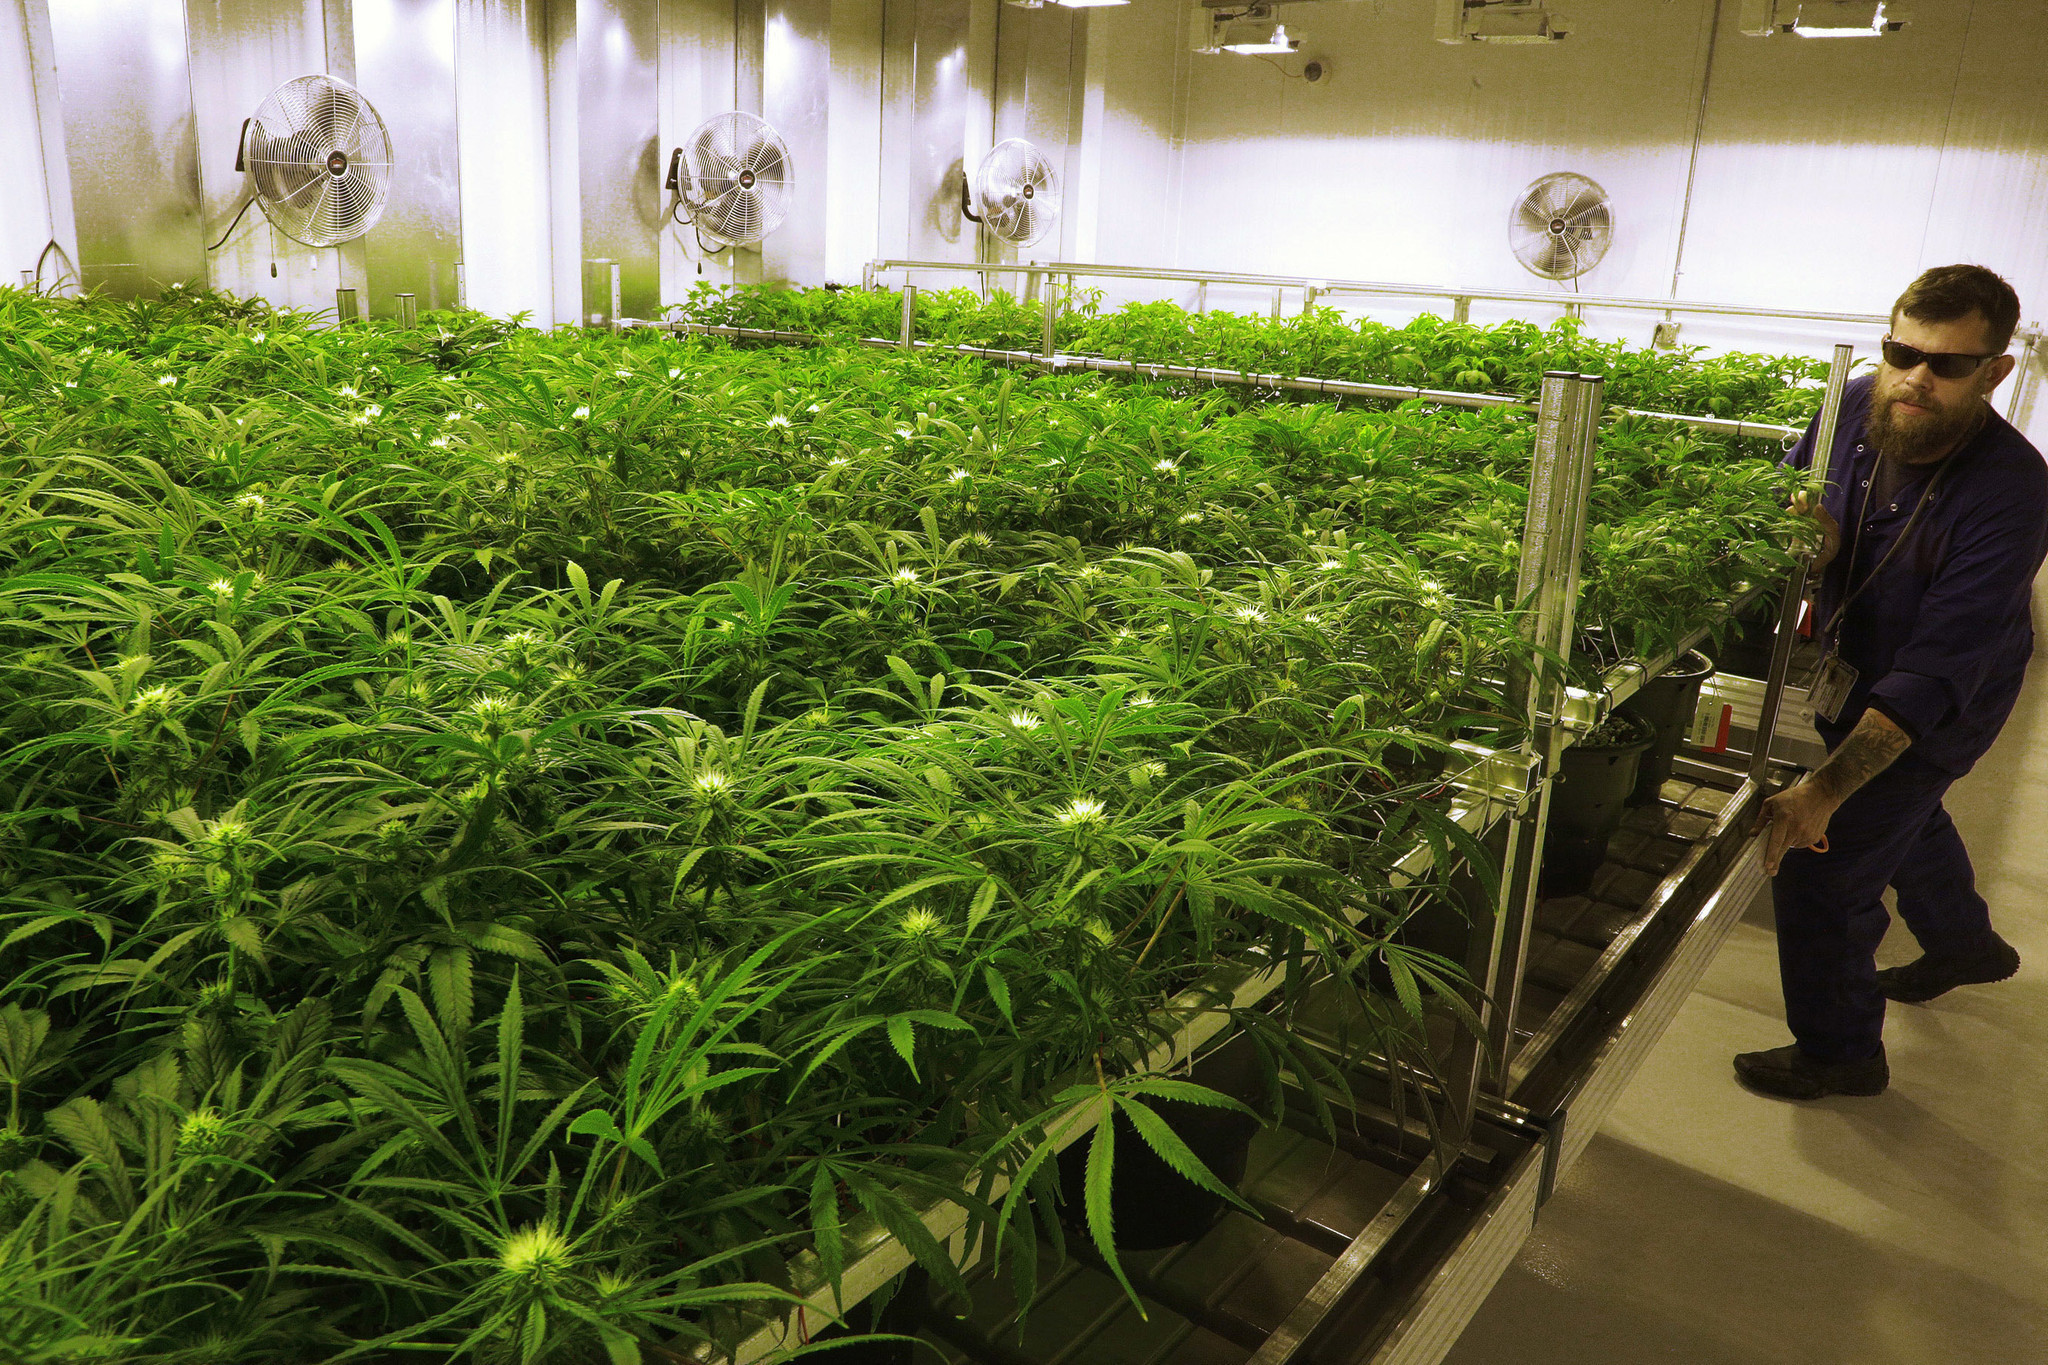 It S Time For The Dea To Reclassify Marijuana La Times